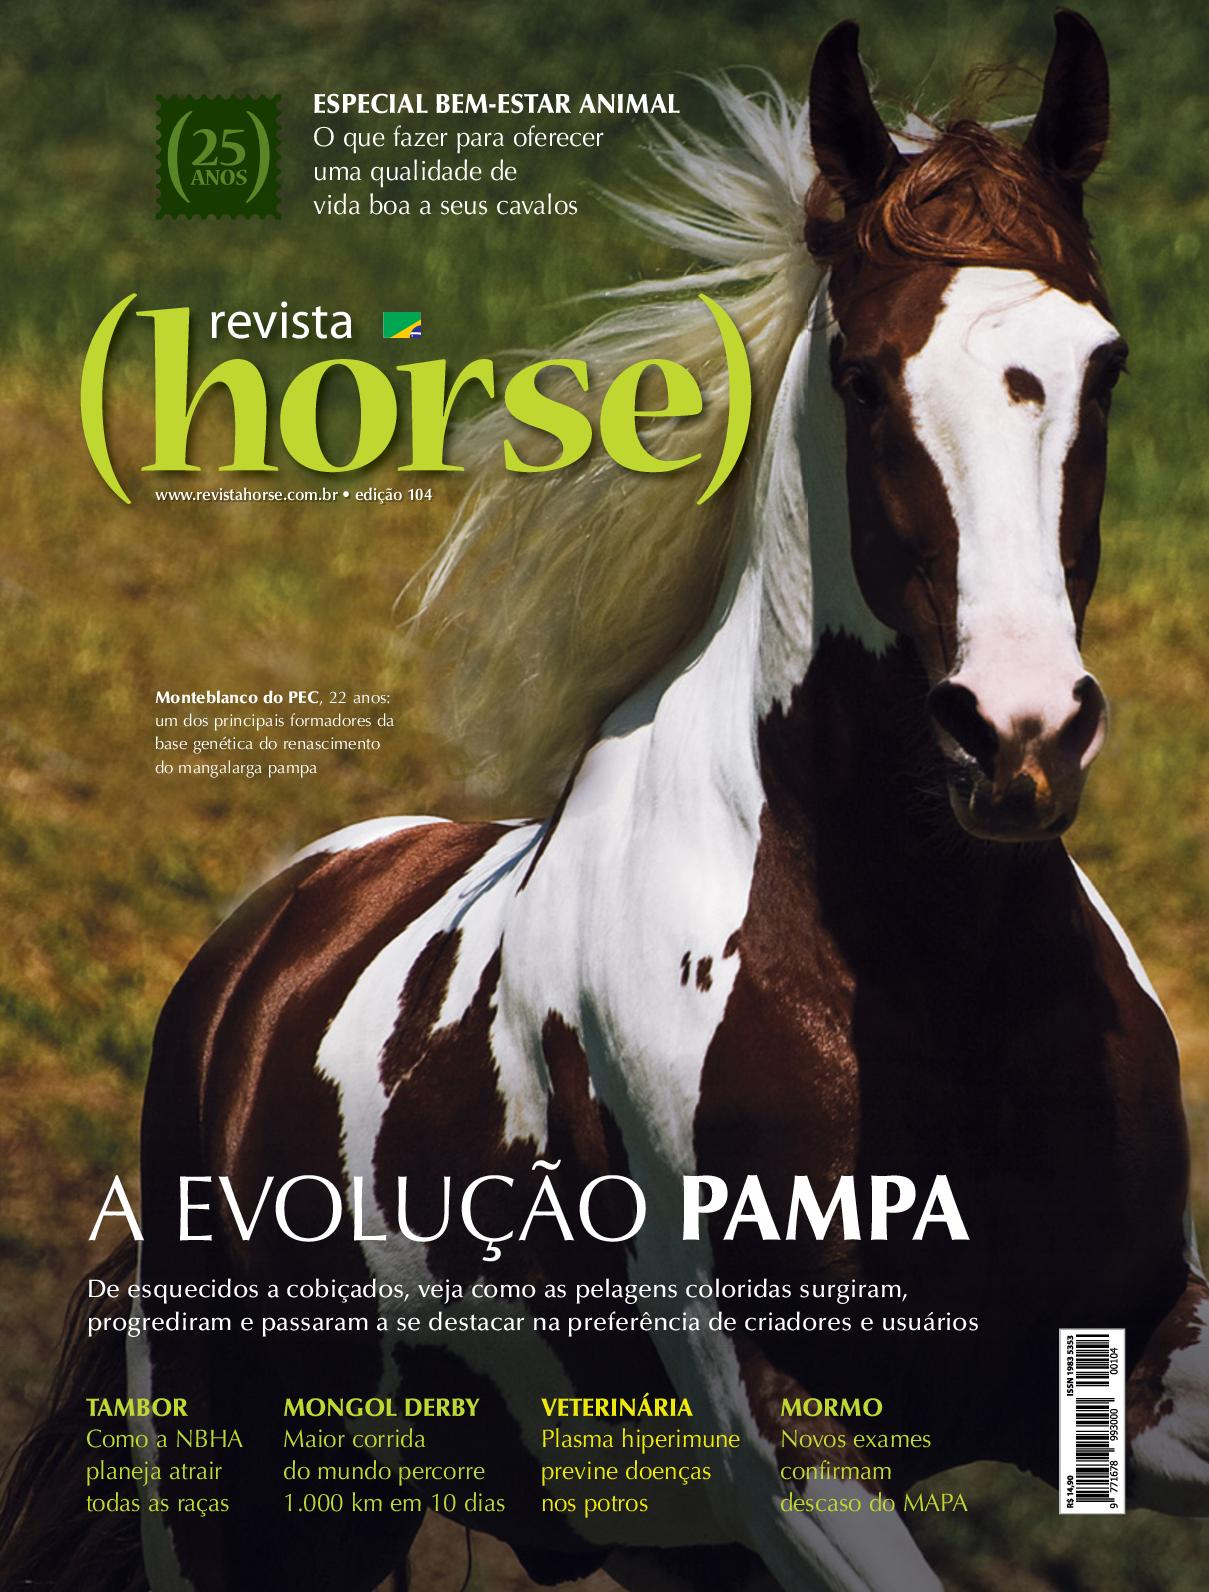 003b8bfb3 Calaméo - Revista Horse 104